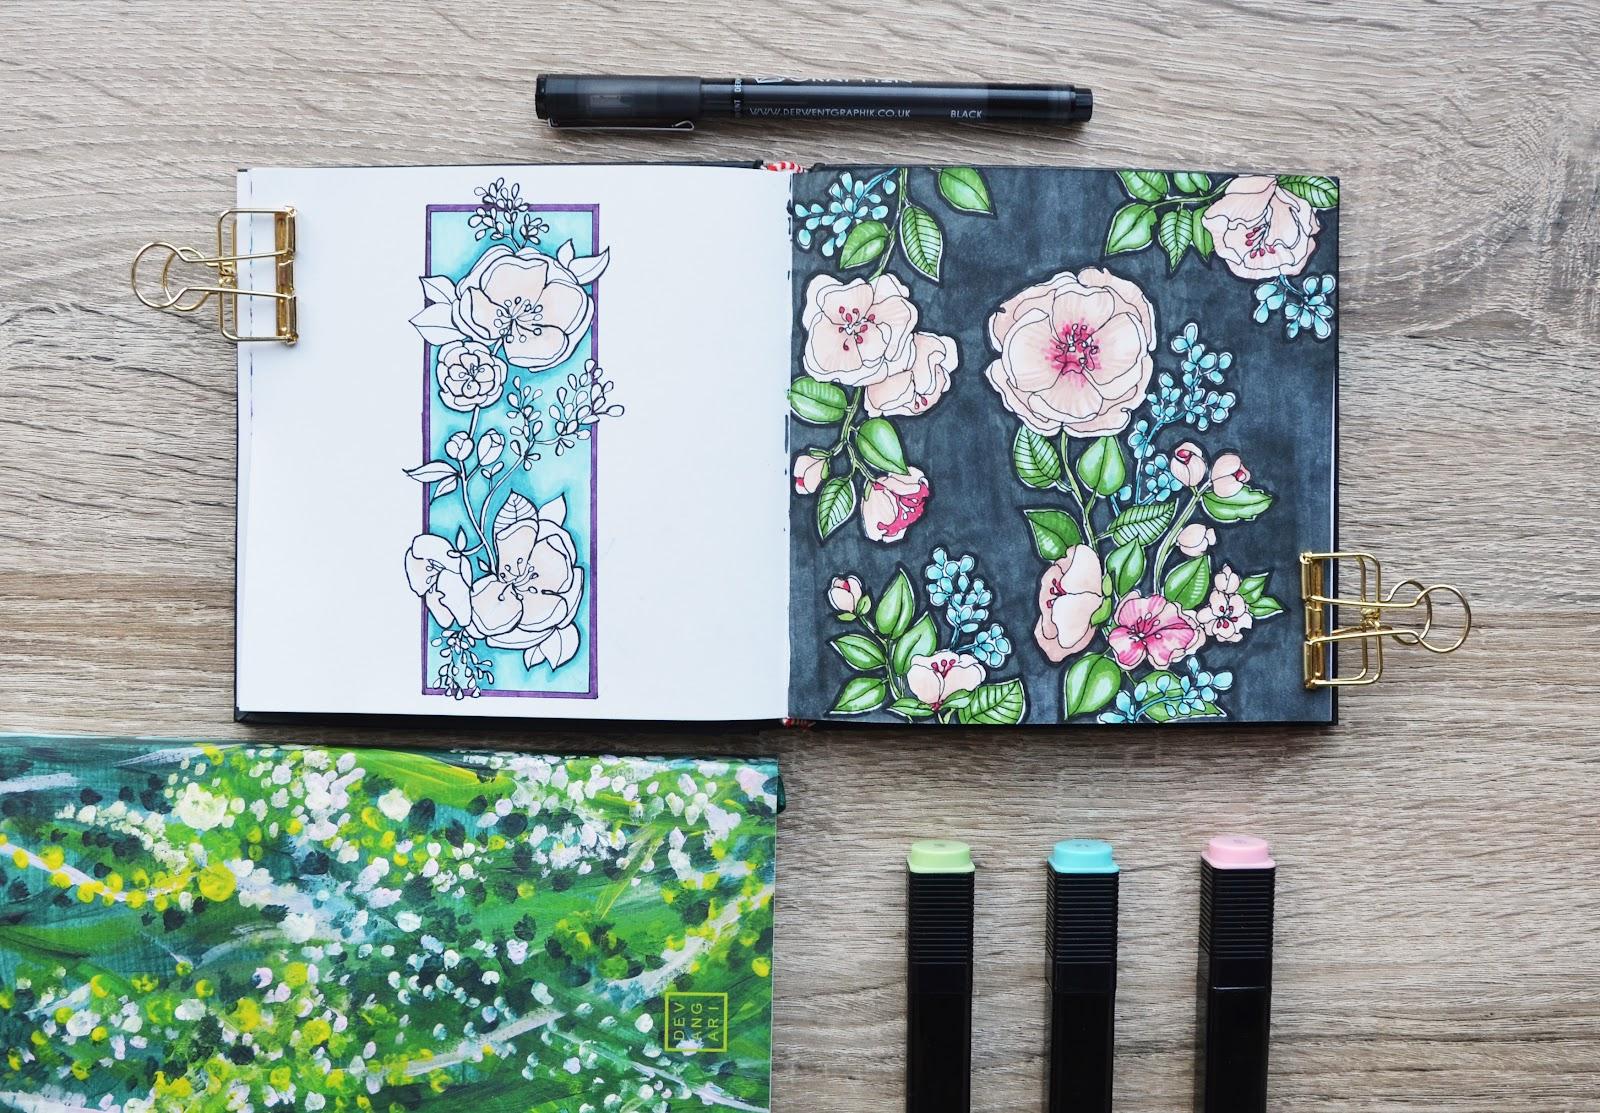 Kwiaty rysowane markerami alkoholowymi, w tle notes w kropki Garden